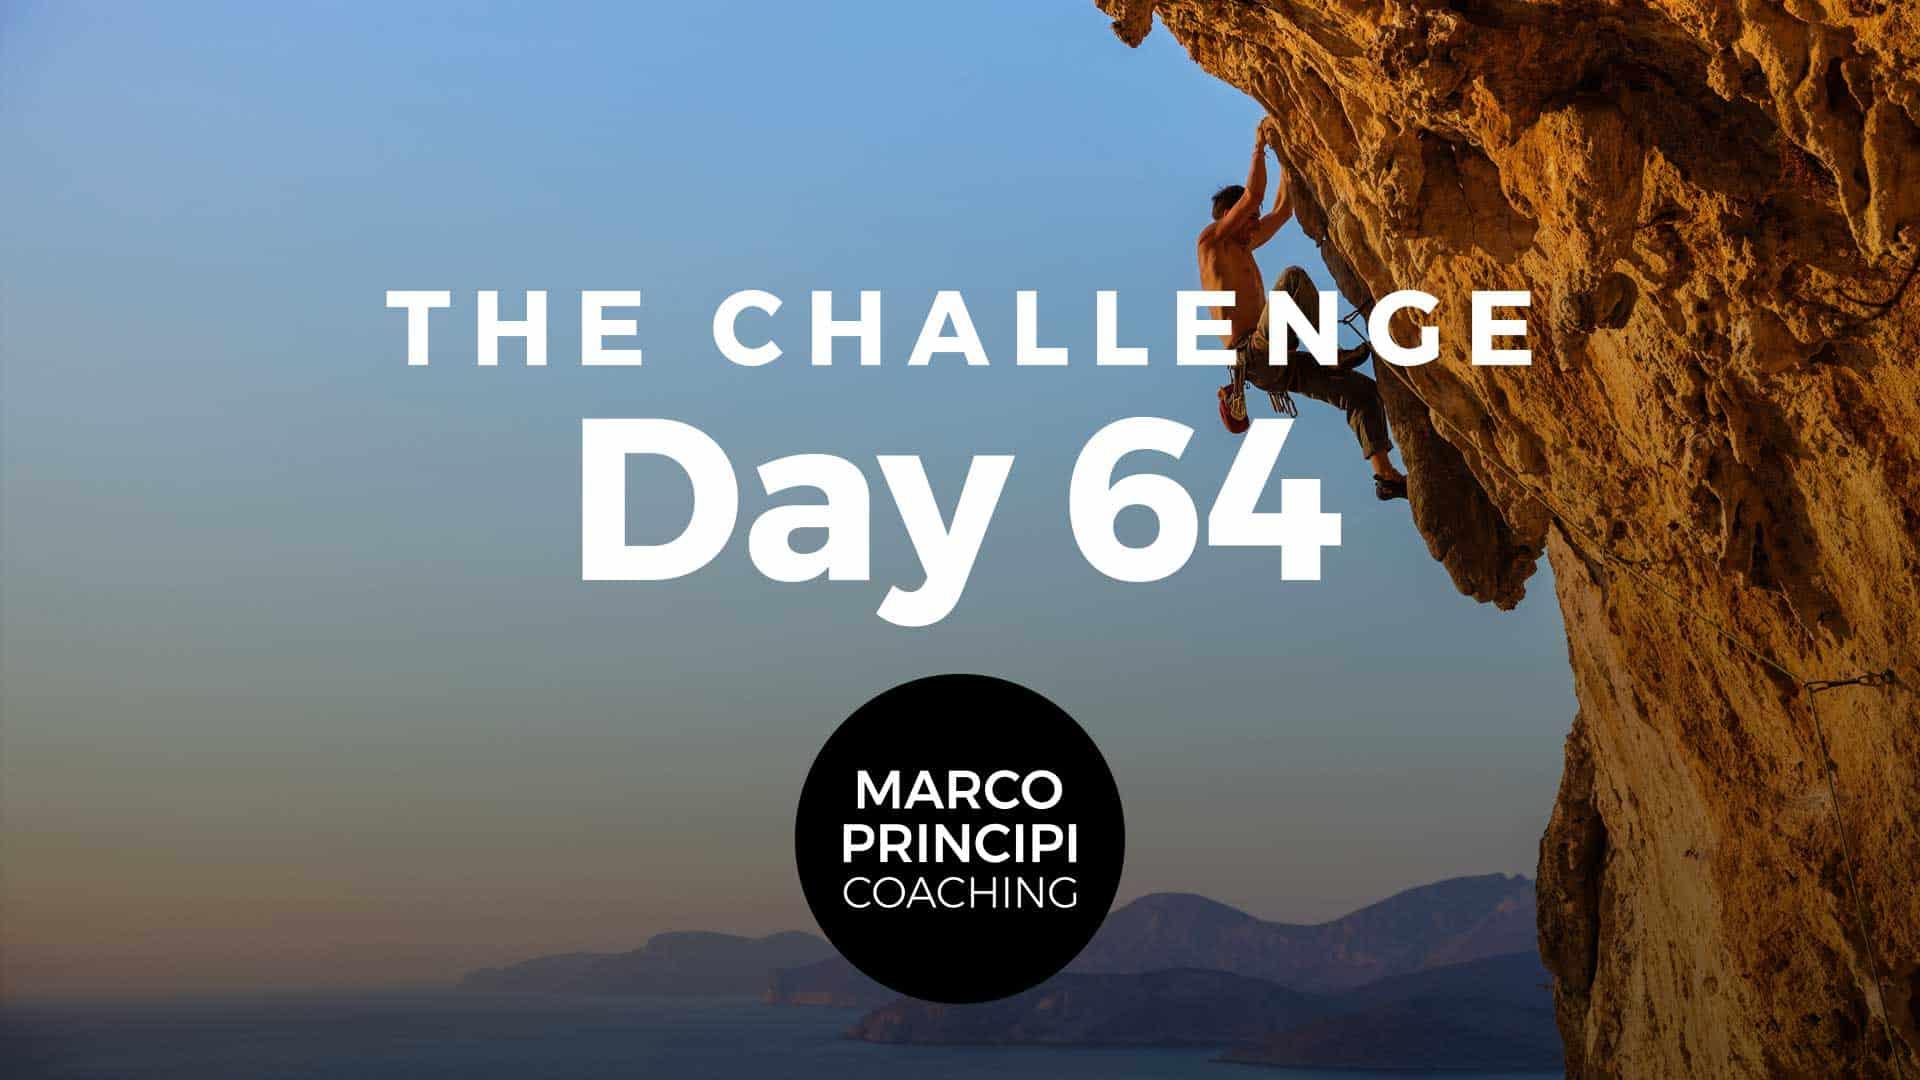 Marco Principi The Challenge Day 64